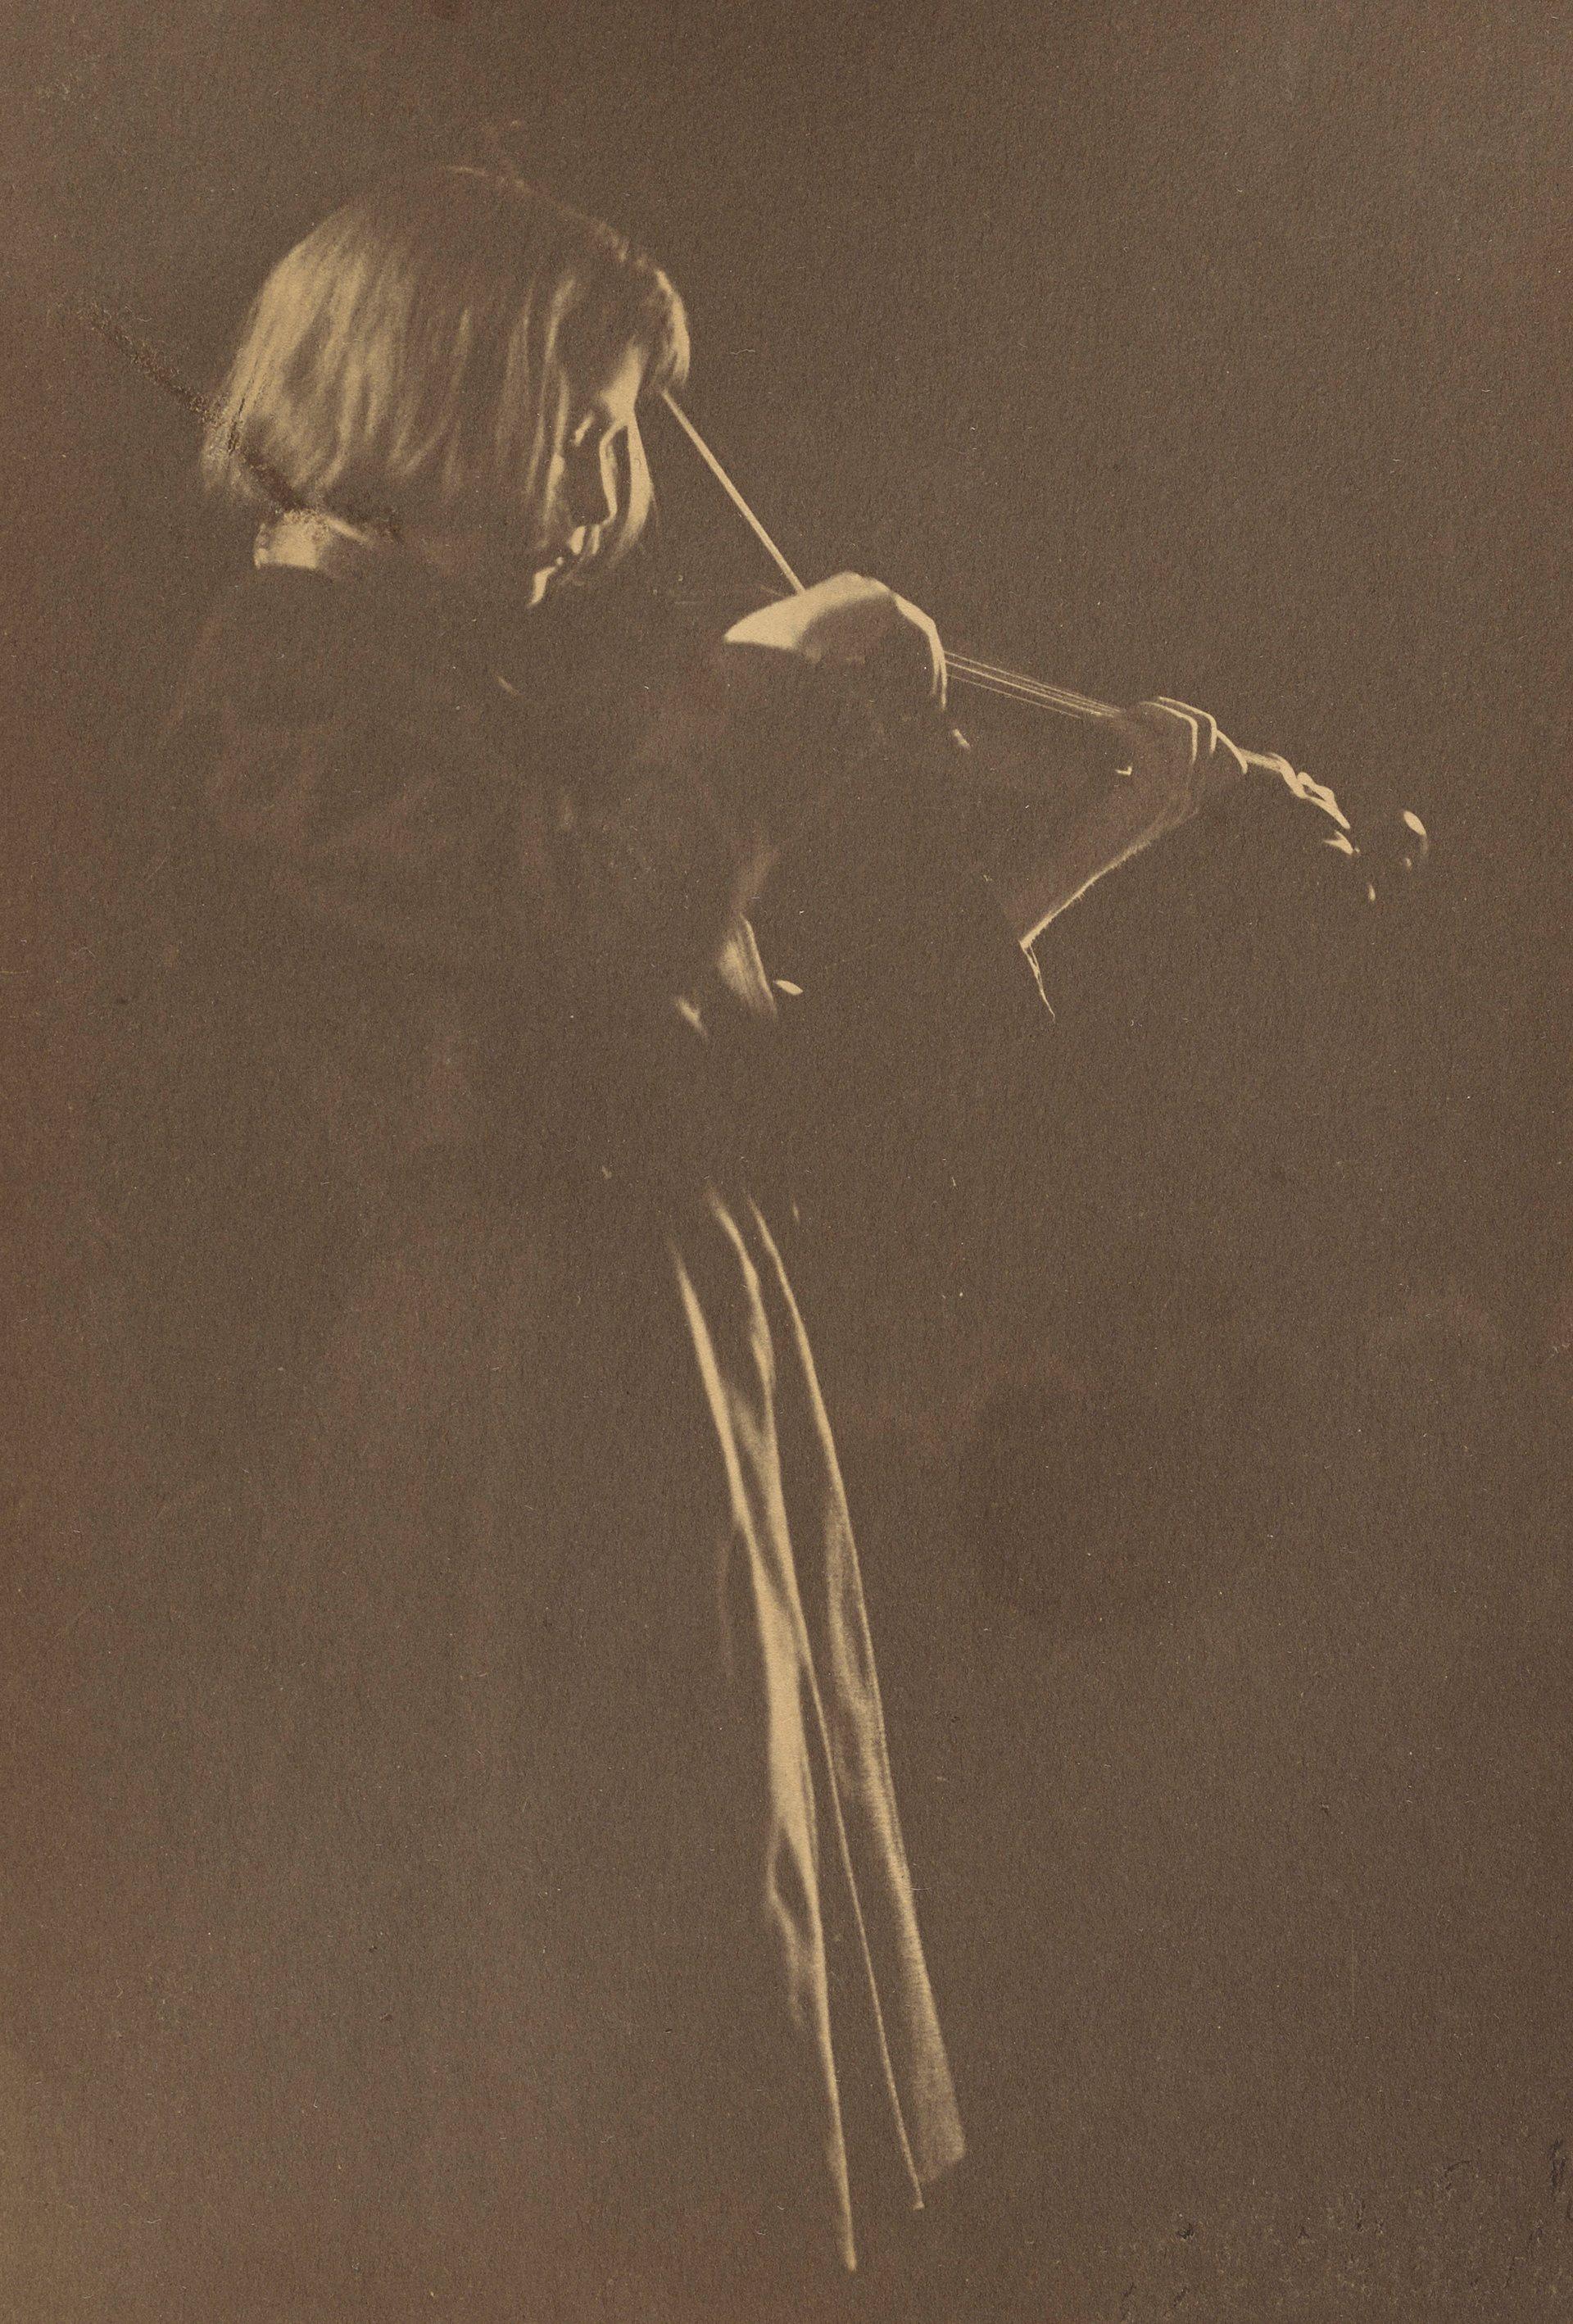 Gertrude Käsebier - Standing Girl with Violin, 1896–98 © Gertrude Käsebier, The J. Paul Getty Museum, Los Angeles